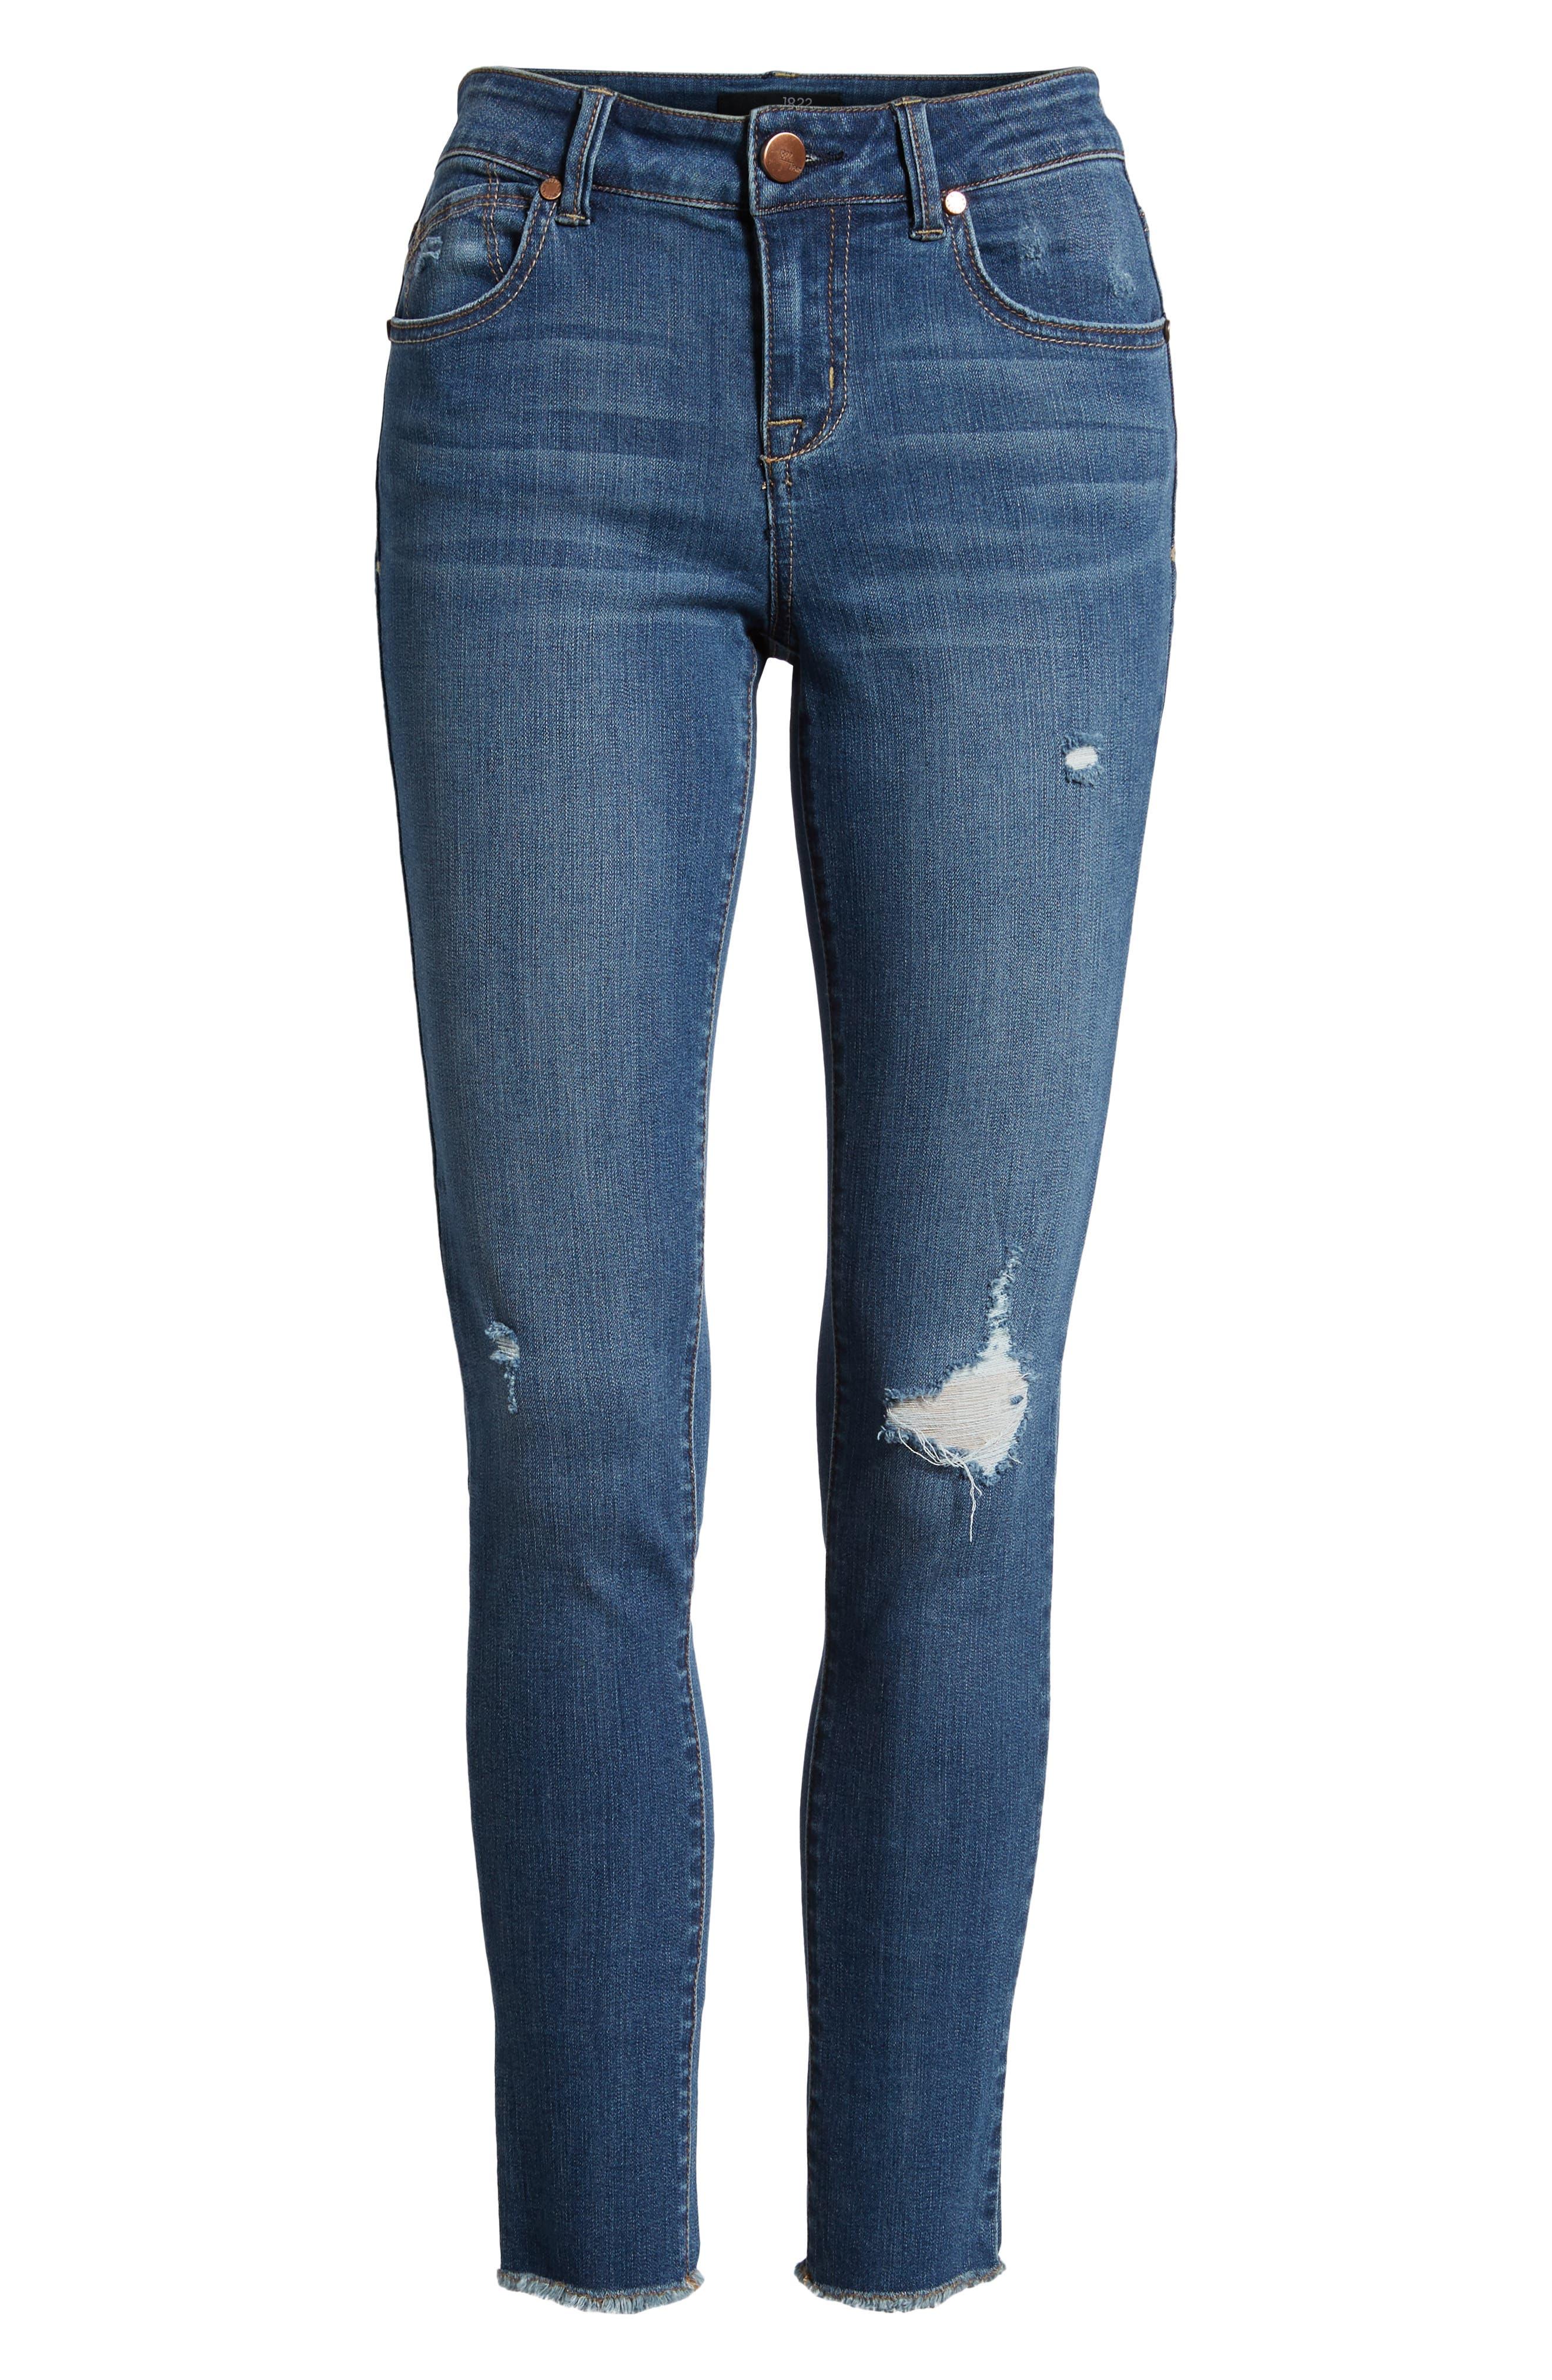 1822 DENIM,                             Distressed Skinny Jeans,                             Alternate thumbnail 7, color,                             CHRISTINA